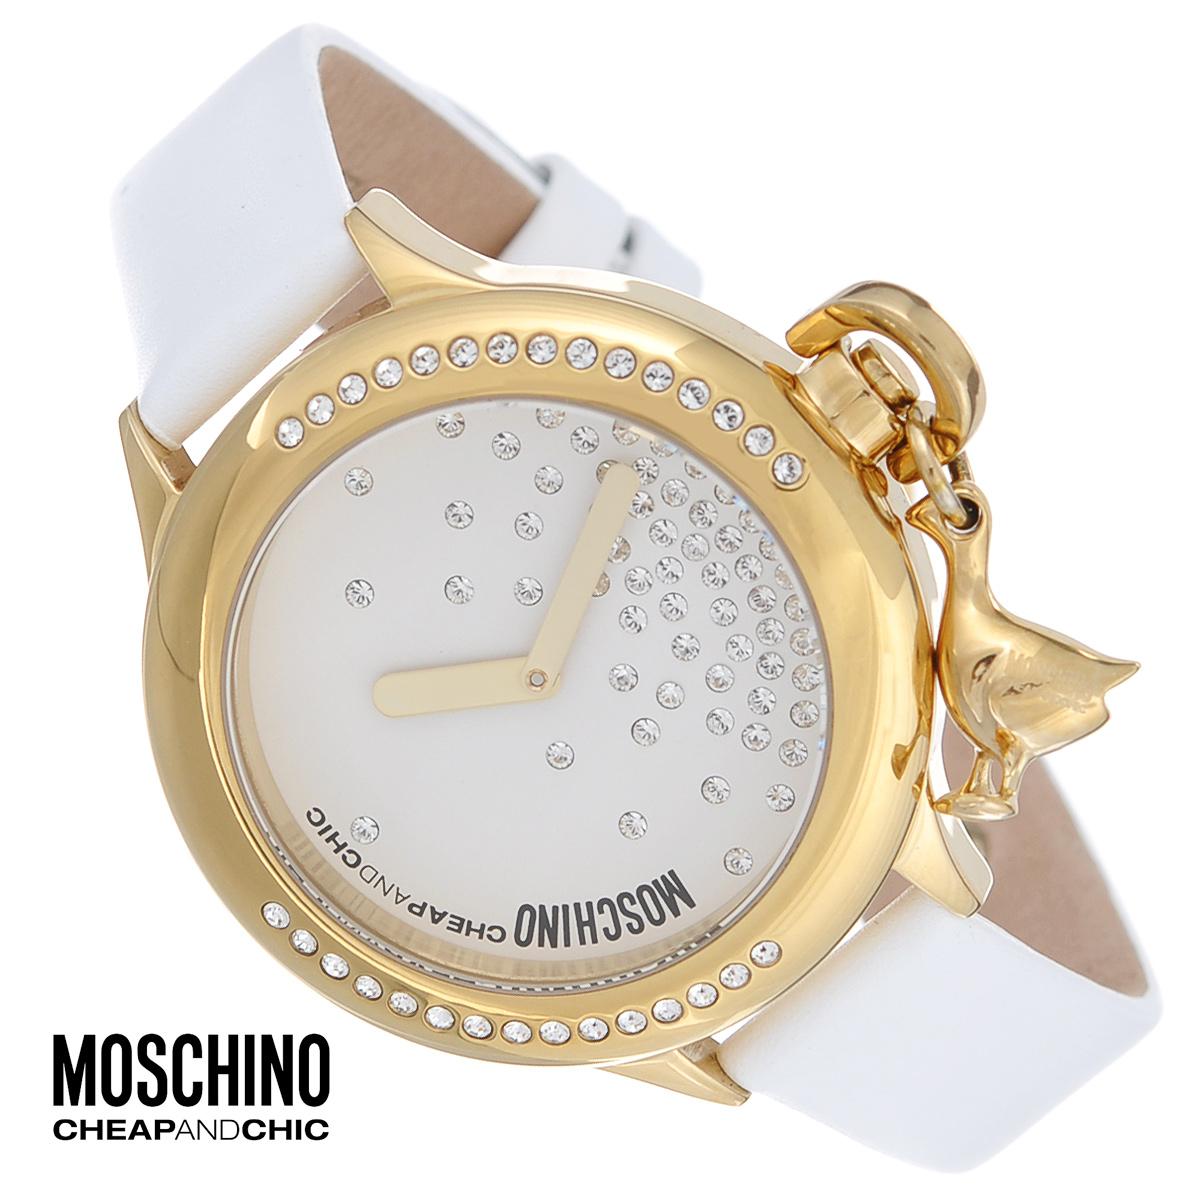 ���� ������� �������� Moschino, ����: �����, �������. MW0044MW0044�������� ���� �� ���������� ������������ ������ Moschino - ��� �� ������ �������� � �������������� ���������, �� � ����������� ���������, ������������ � ��������������� �������� � �����������������. ���� Moschino �������� ��������� ����������. ������ �������� �� ������������������ ����������� ����� � PVD-���������. ��������� ����������� �������� ���������� � ������� ����������� �������. �������� ������� ��������� ��������� � ���� �����. ���� ����� ��� ������� - ������� � ��������. ������� ����� �������� �� ����������� ���� � ������� ������������ ���������. ���� ��������� � ��������� ������������� ������� � ��������� ������. ���� Moschino ��������� ������ ����������� ������� ���������� �� ����� ������ ����� ������������� ������������, �����������������, � ����� ������� ���������� ����������� �������. ������ ������ ������� ������ �����������������, ������������ �, ����������, ������������ ����. ��������������: �������...